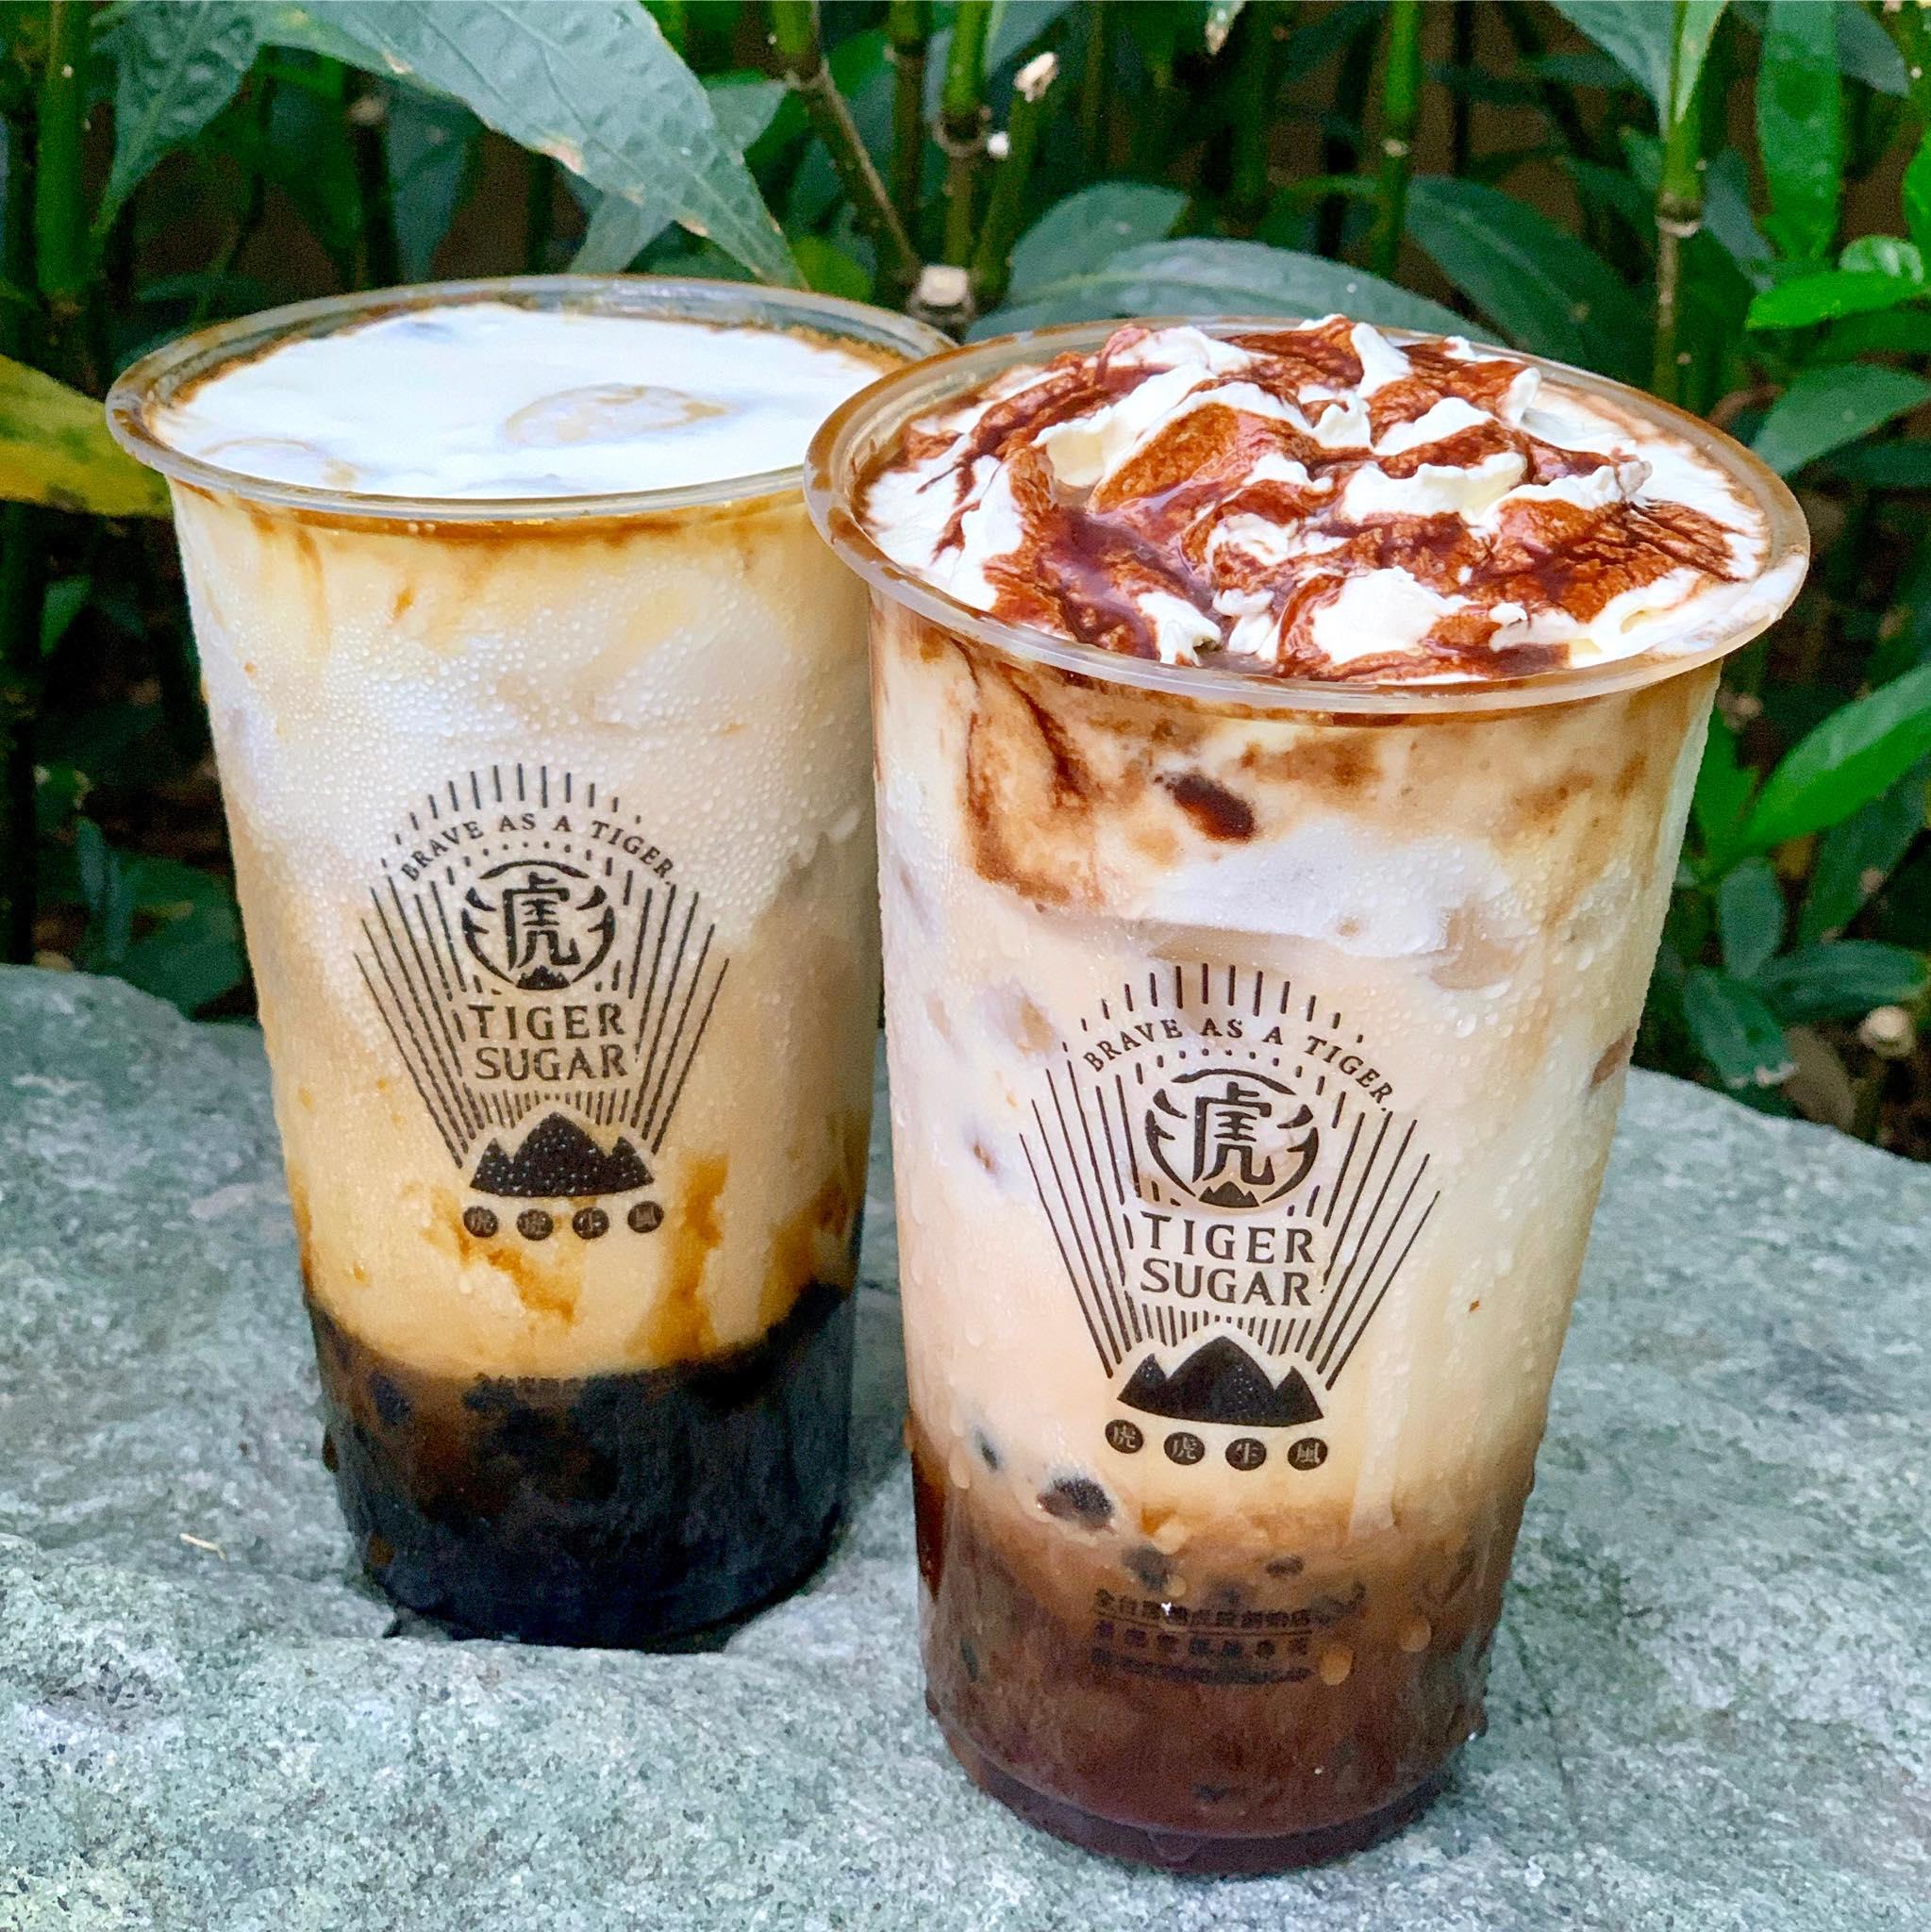 Tiger Sugar Newest, Limited Edition, Brown Sugar Drinks